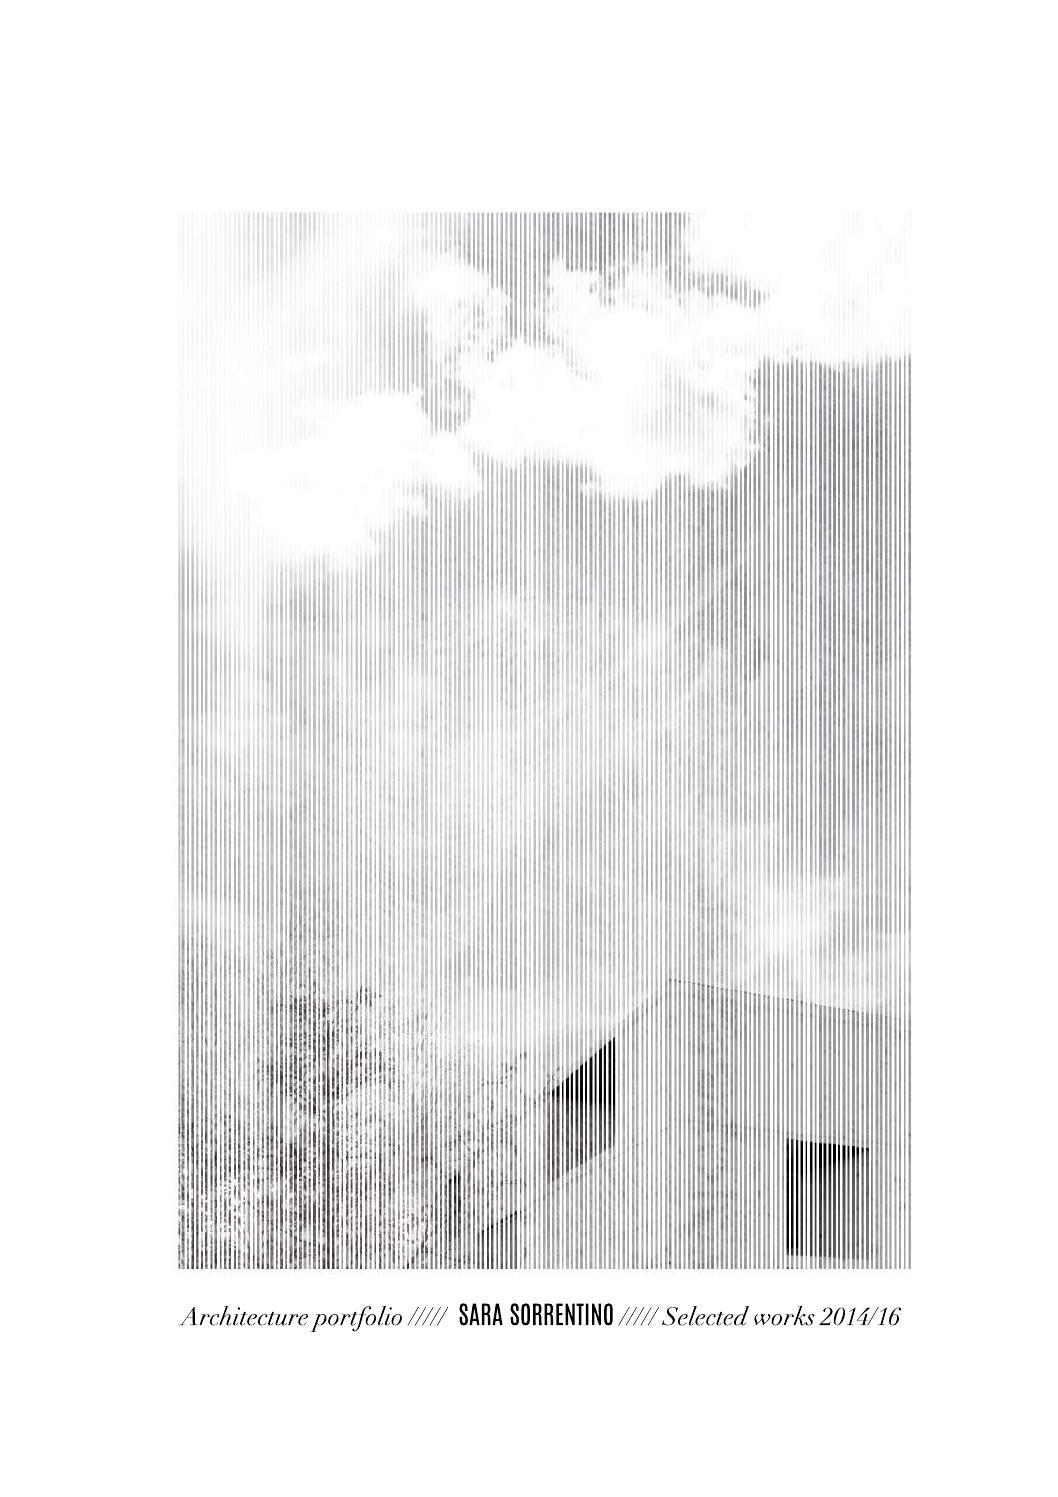 sara sorrentino  architecture portfolio 2016